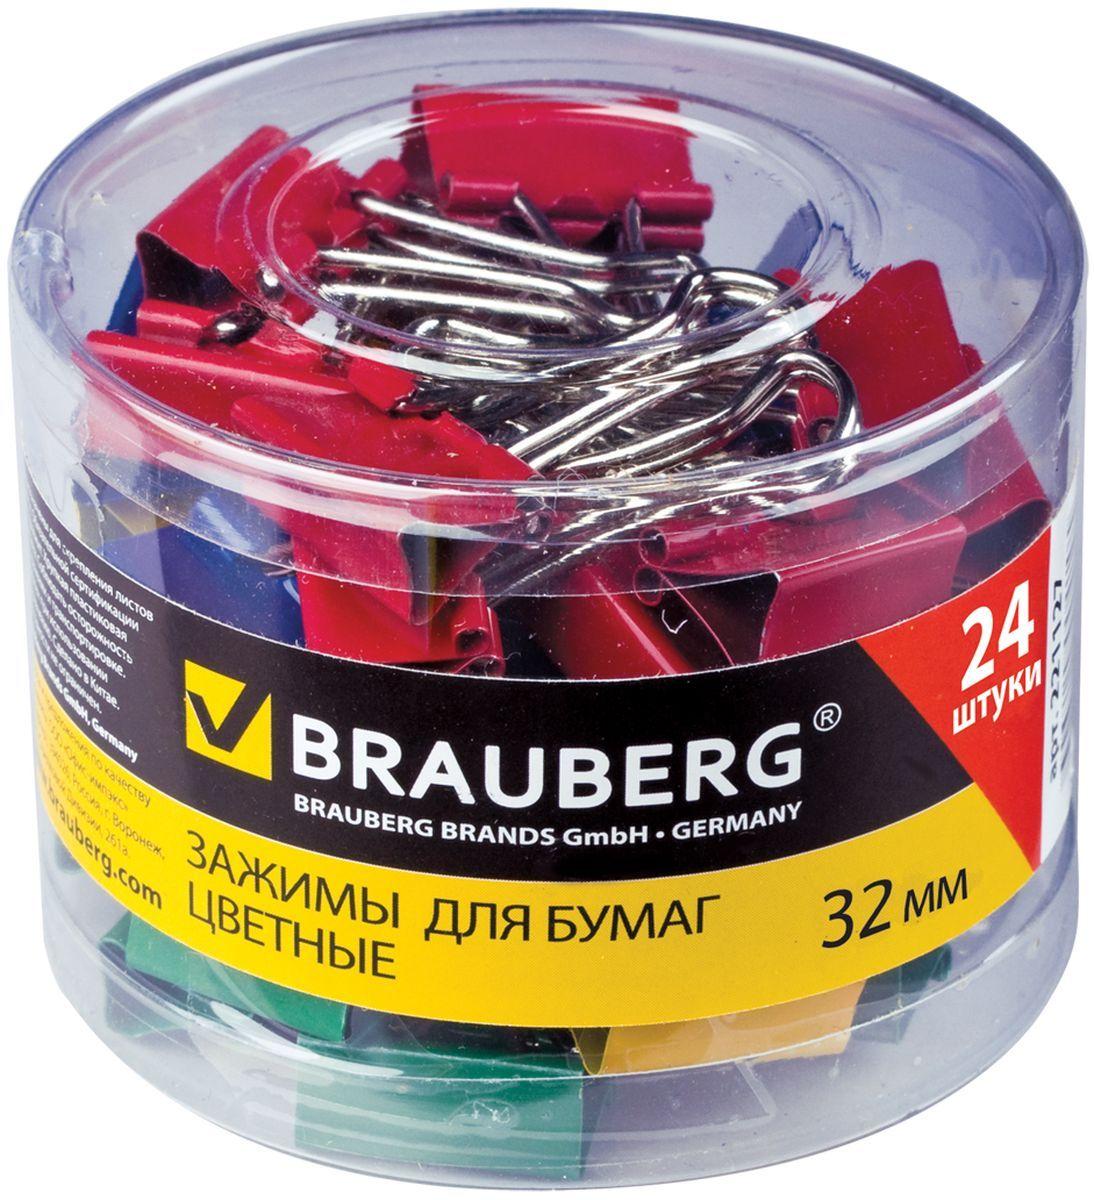 Brauberg Зажим для бумаг 32 мм 24 шт 221129